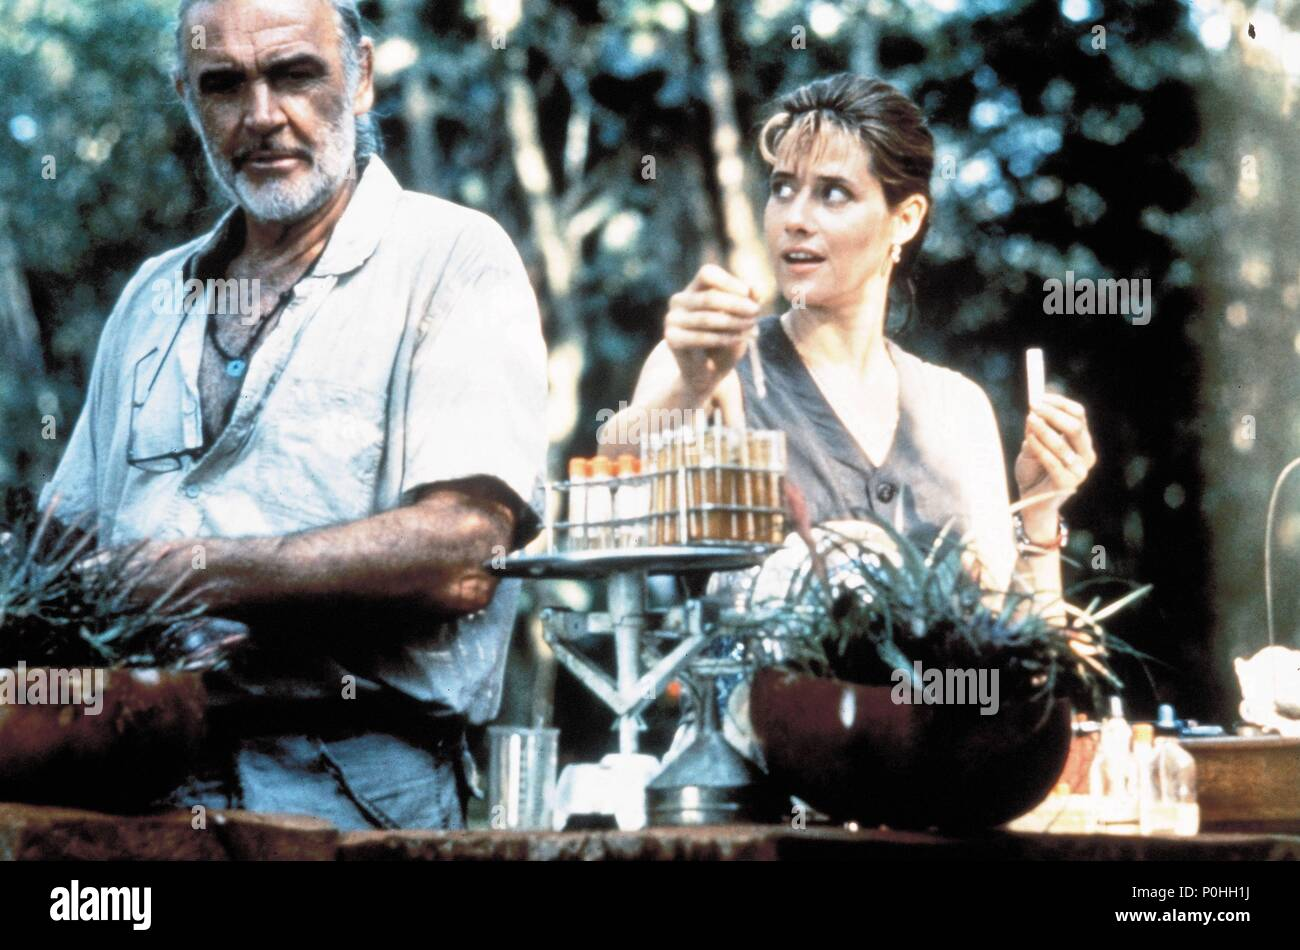 original-film-title-medicine-man-english-title-medicine-man-film-director-john-mctiernan-year-1992-stars-sean-connery-lorraine-bracco-credit-cinergicolumbiatri-star-album-P0HH1J.jpg